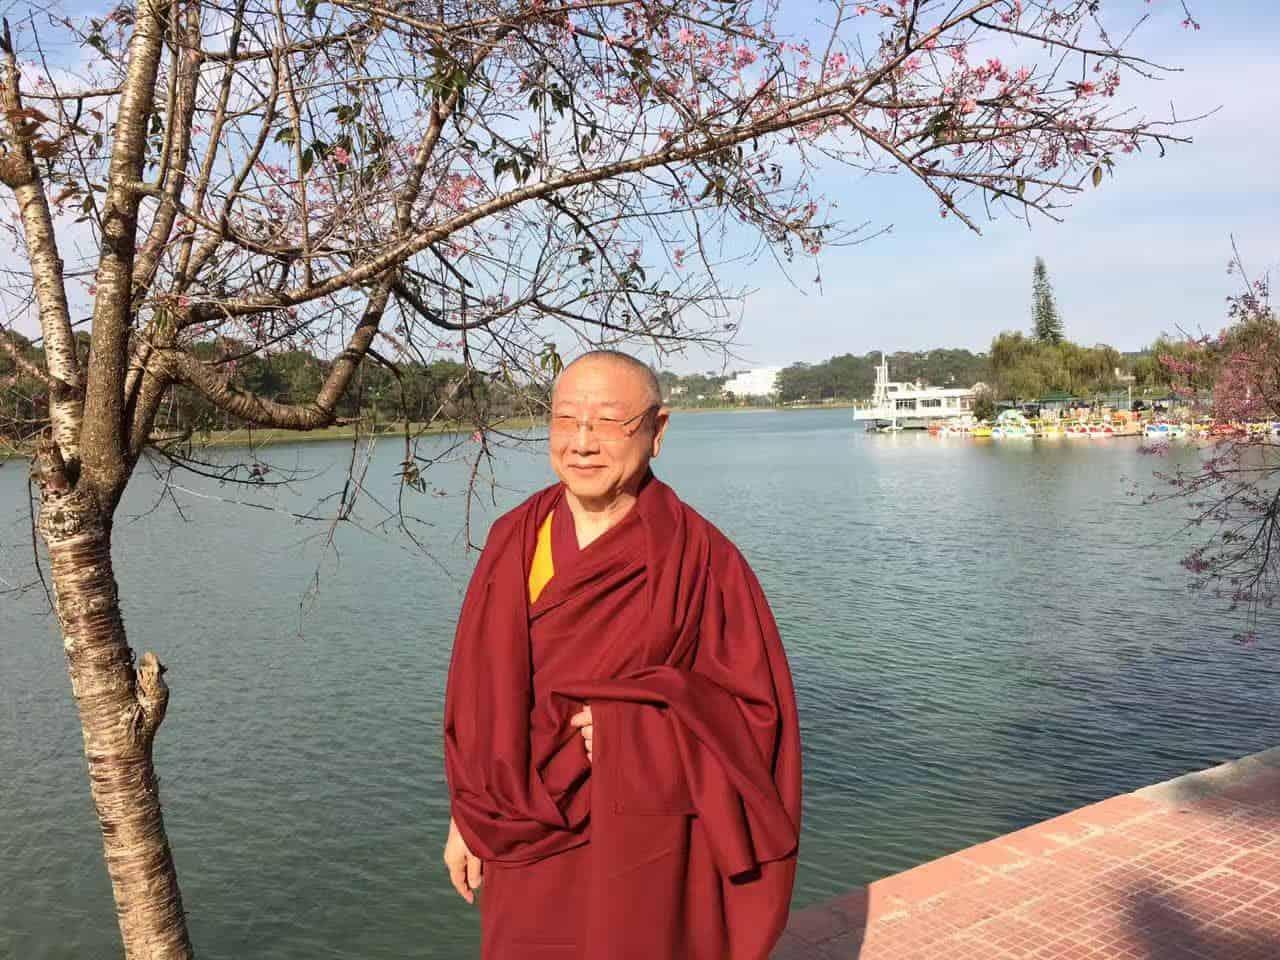 Gosok Rinpoche Vietnam 2017-03-07 afaf23c0b280b308ae865f28a4a426e